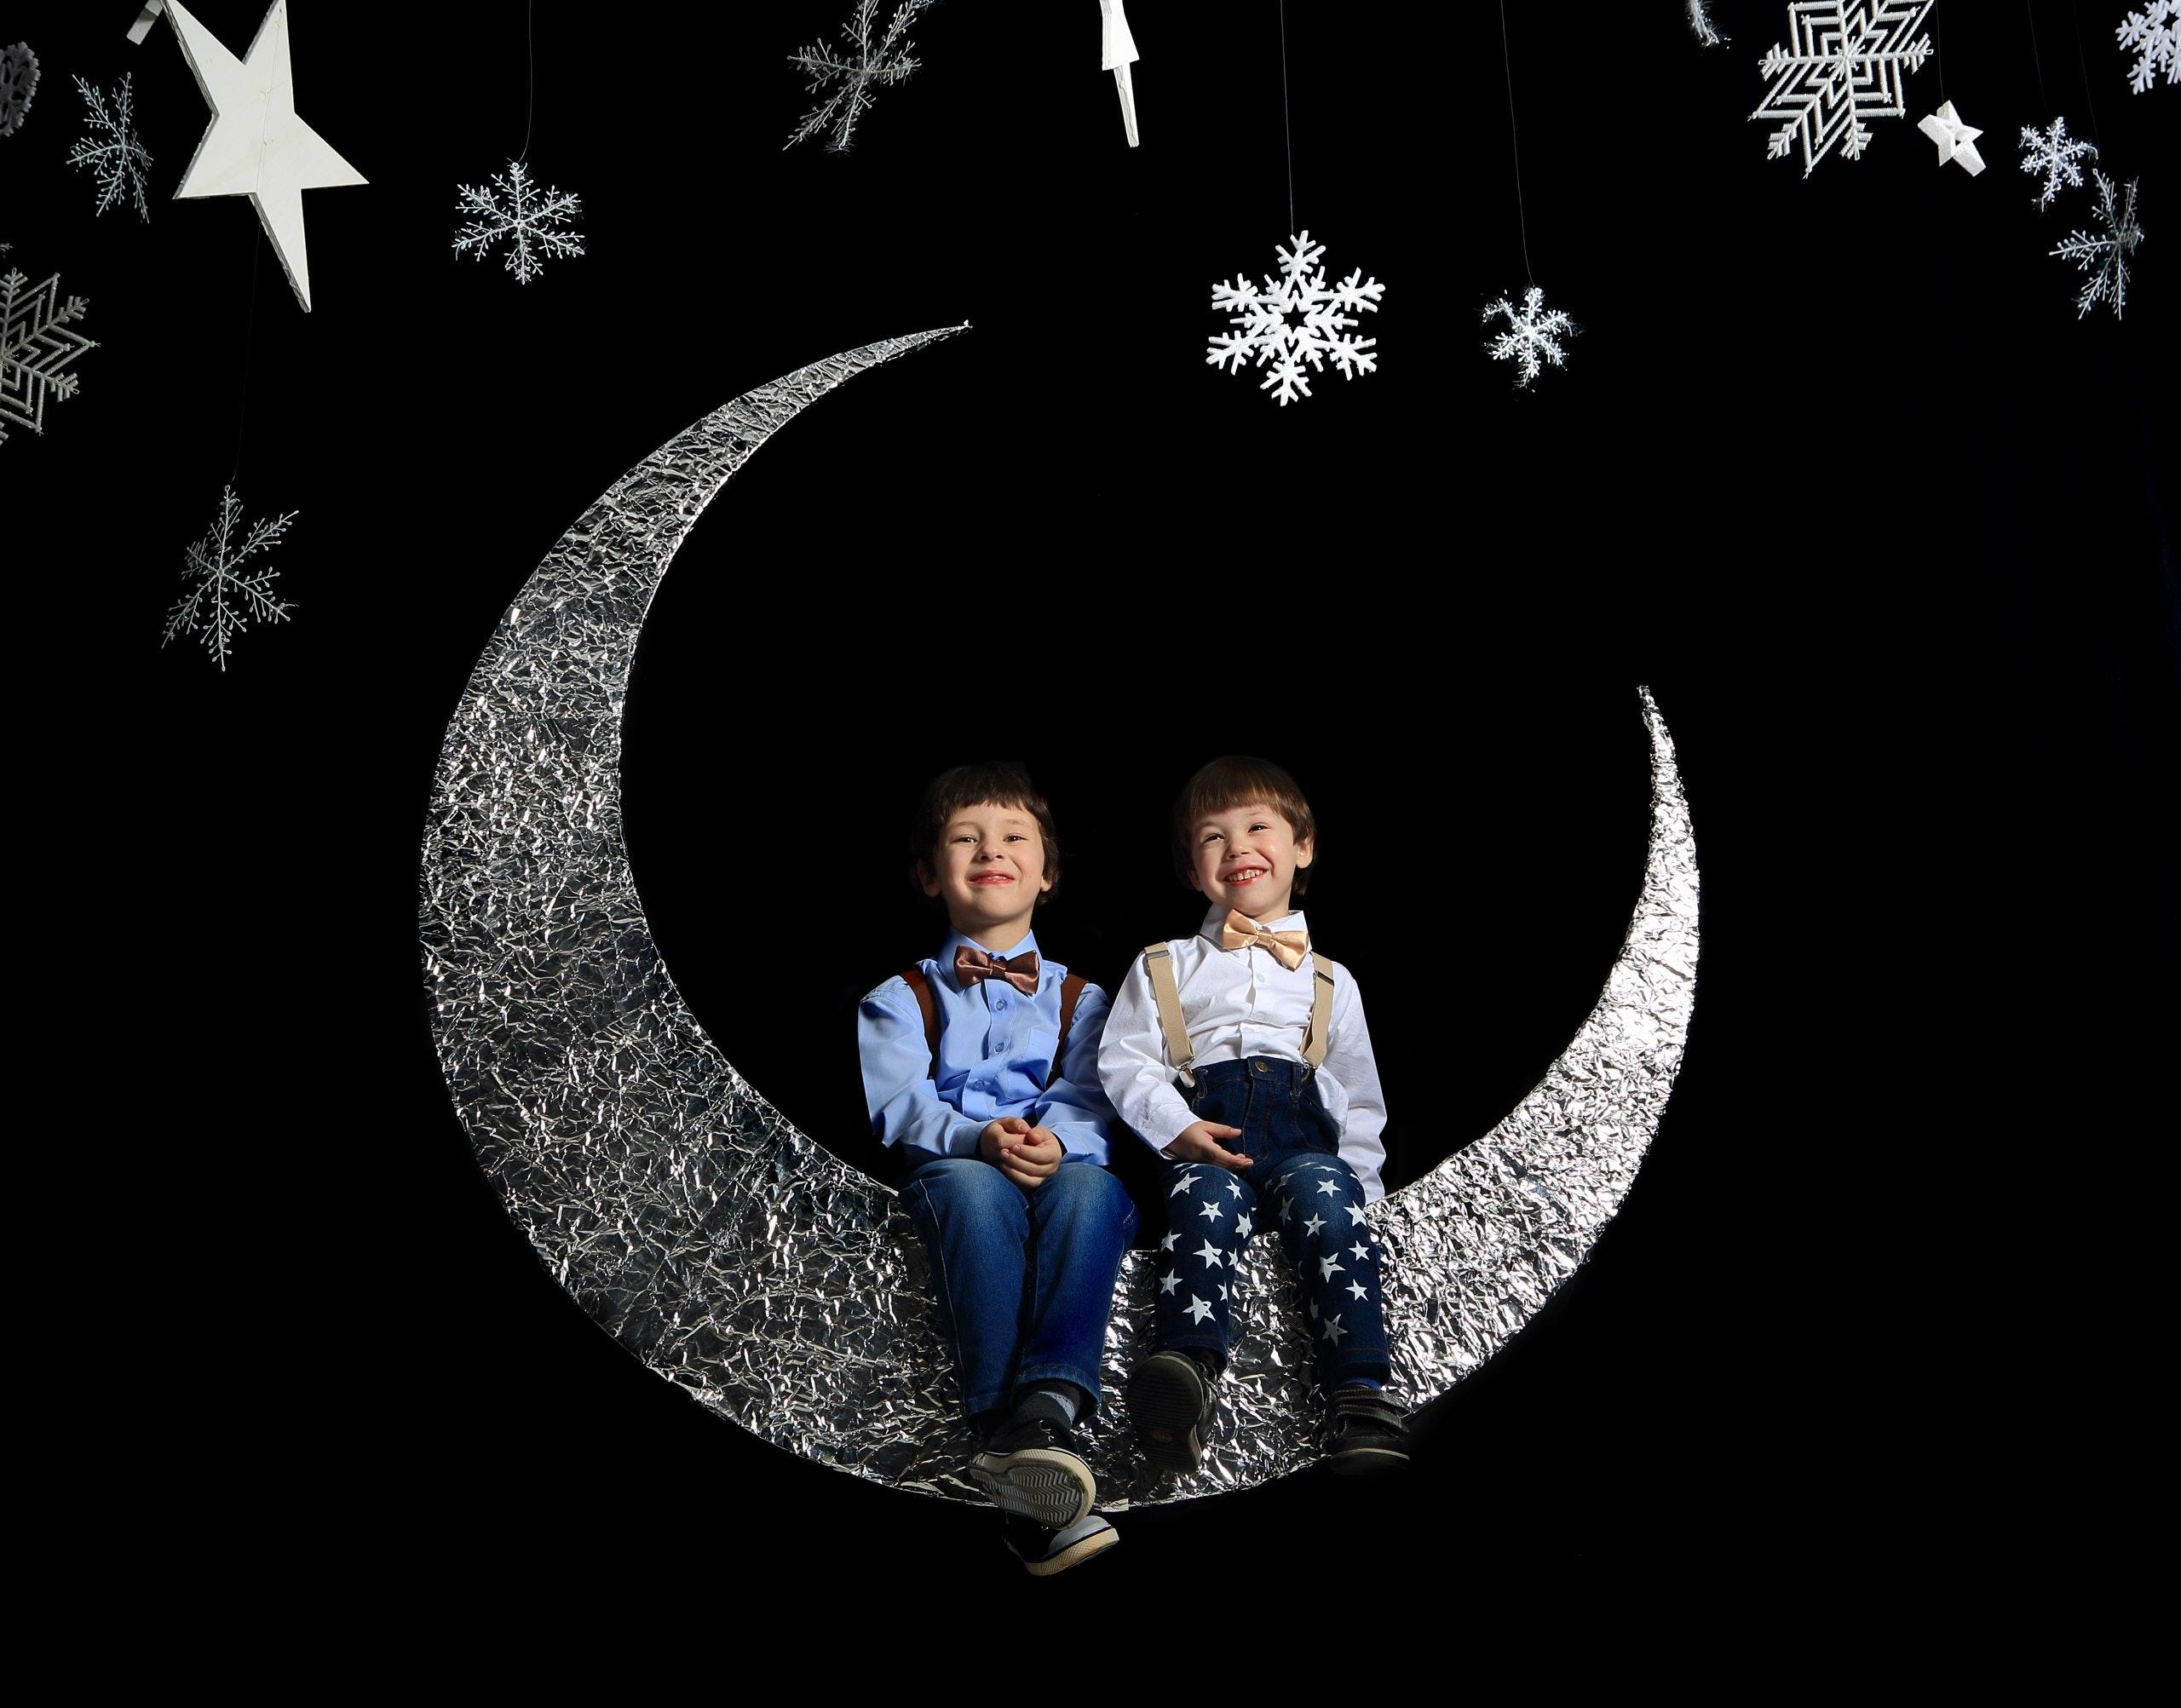 Foto Stok Gratis Tentang Anak Kecil Anak Anak Artis